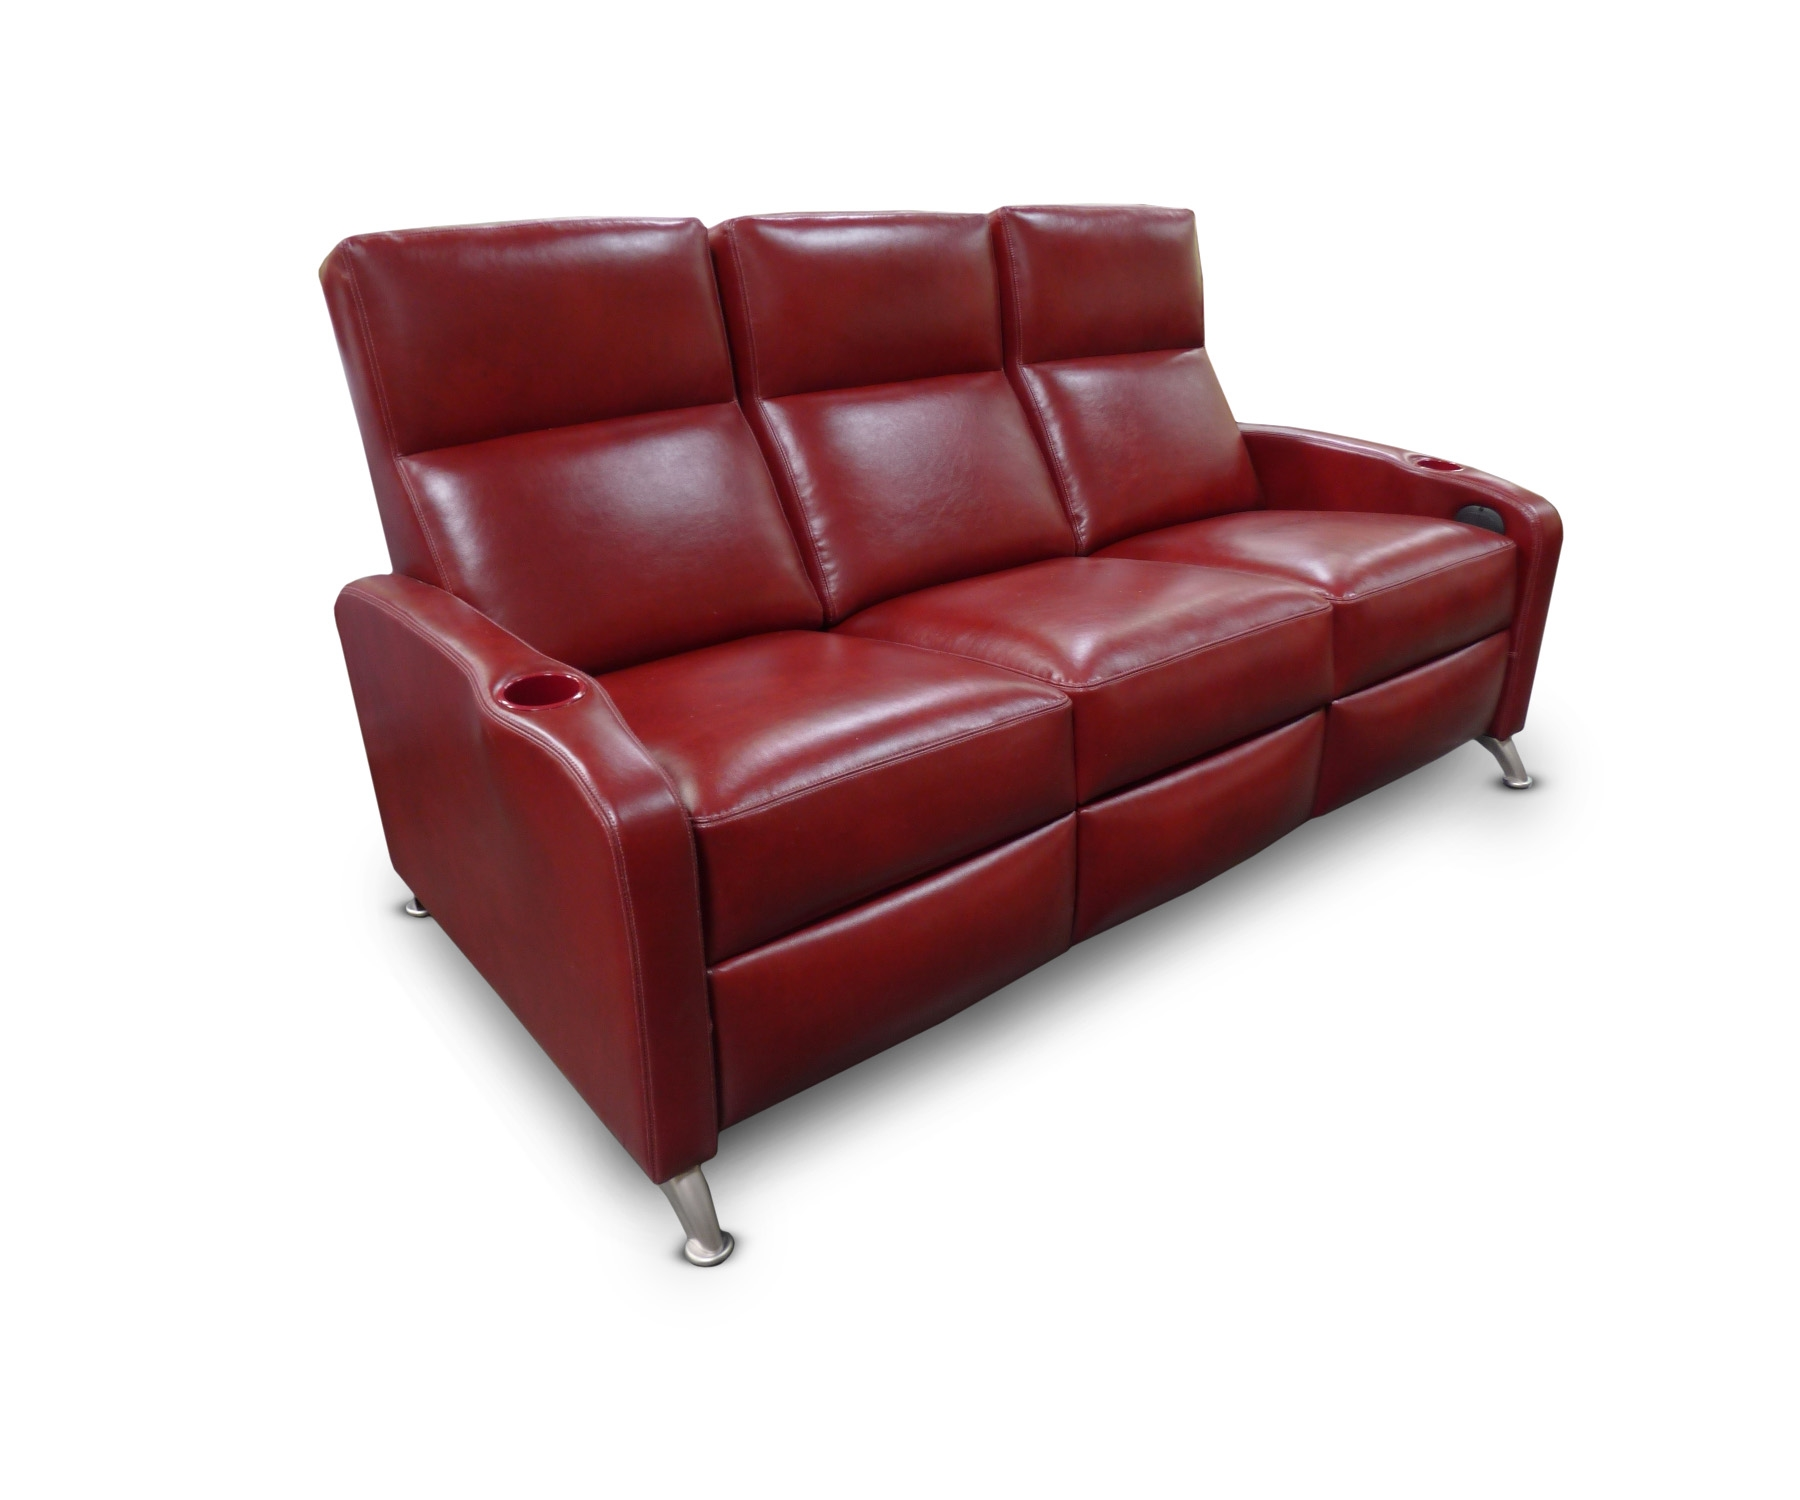 Reclining sofa; Optional chrome feet